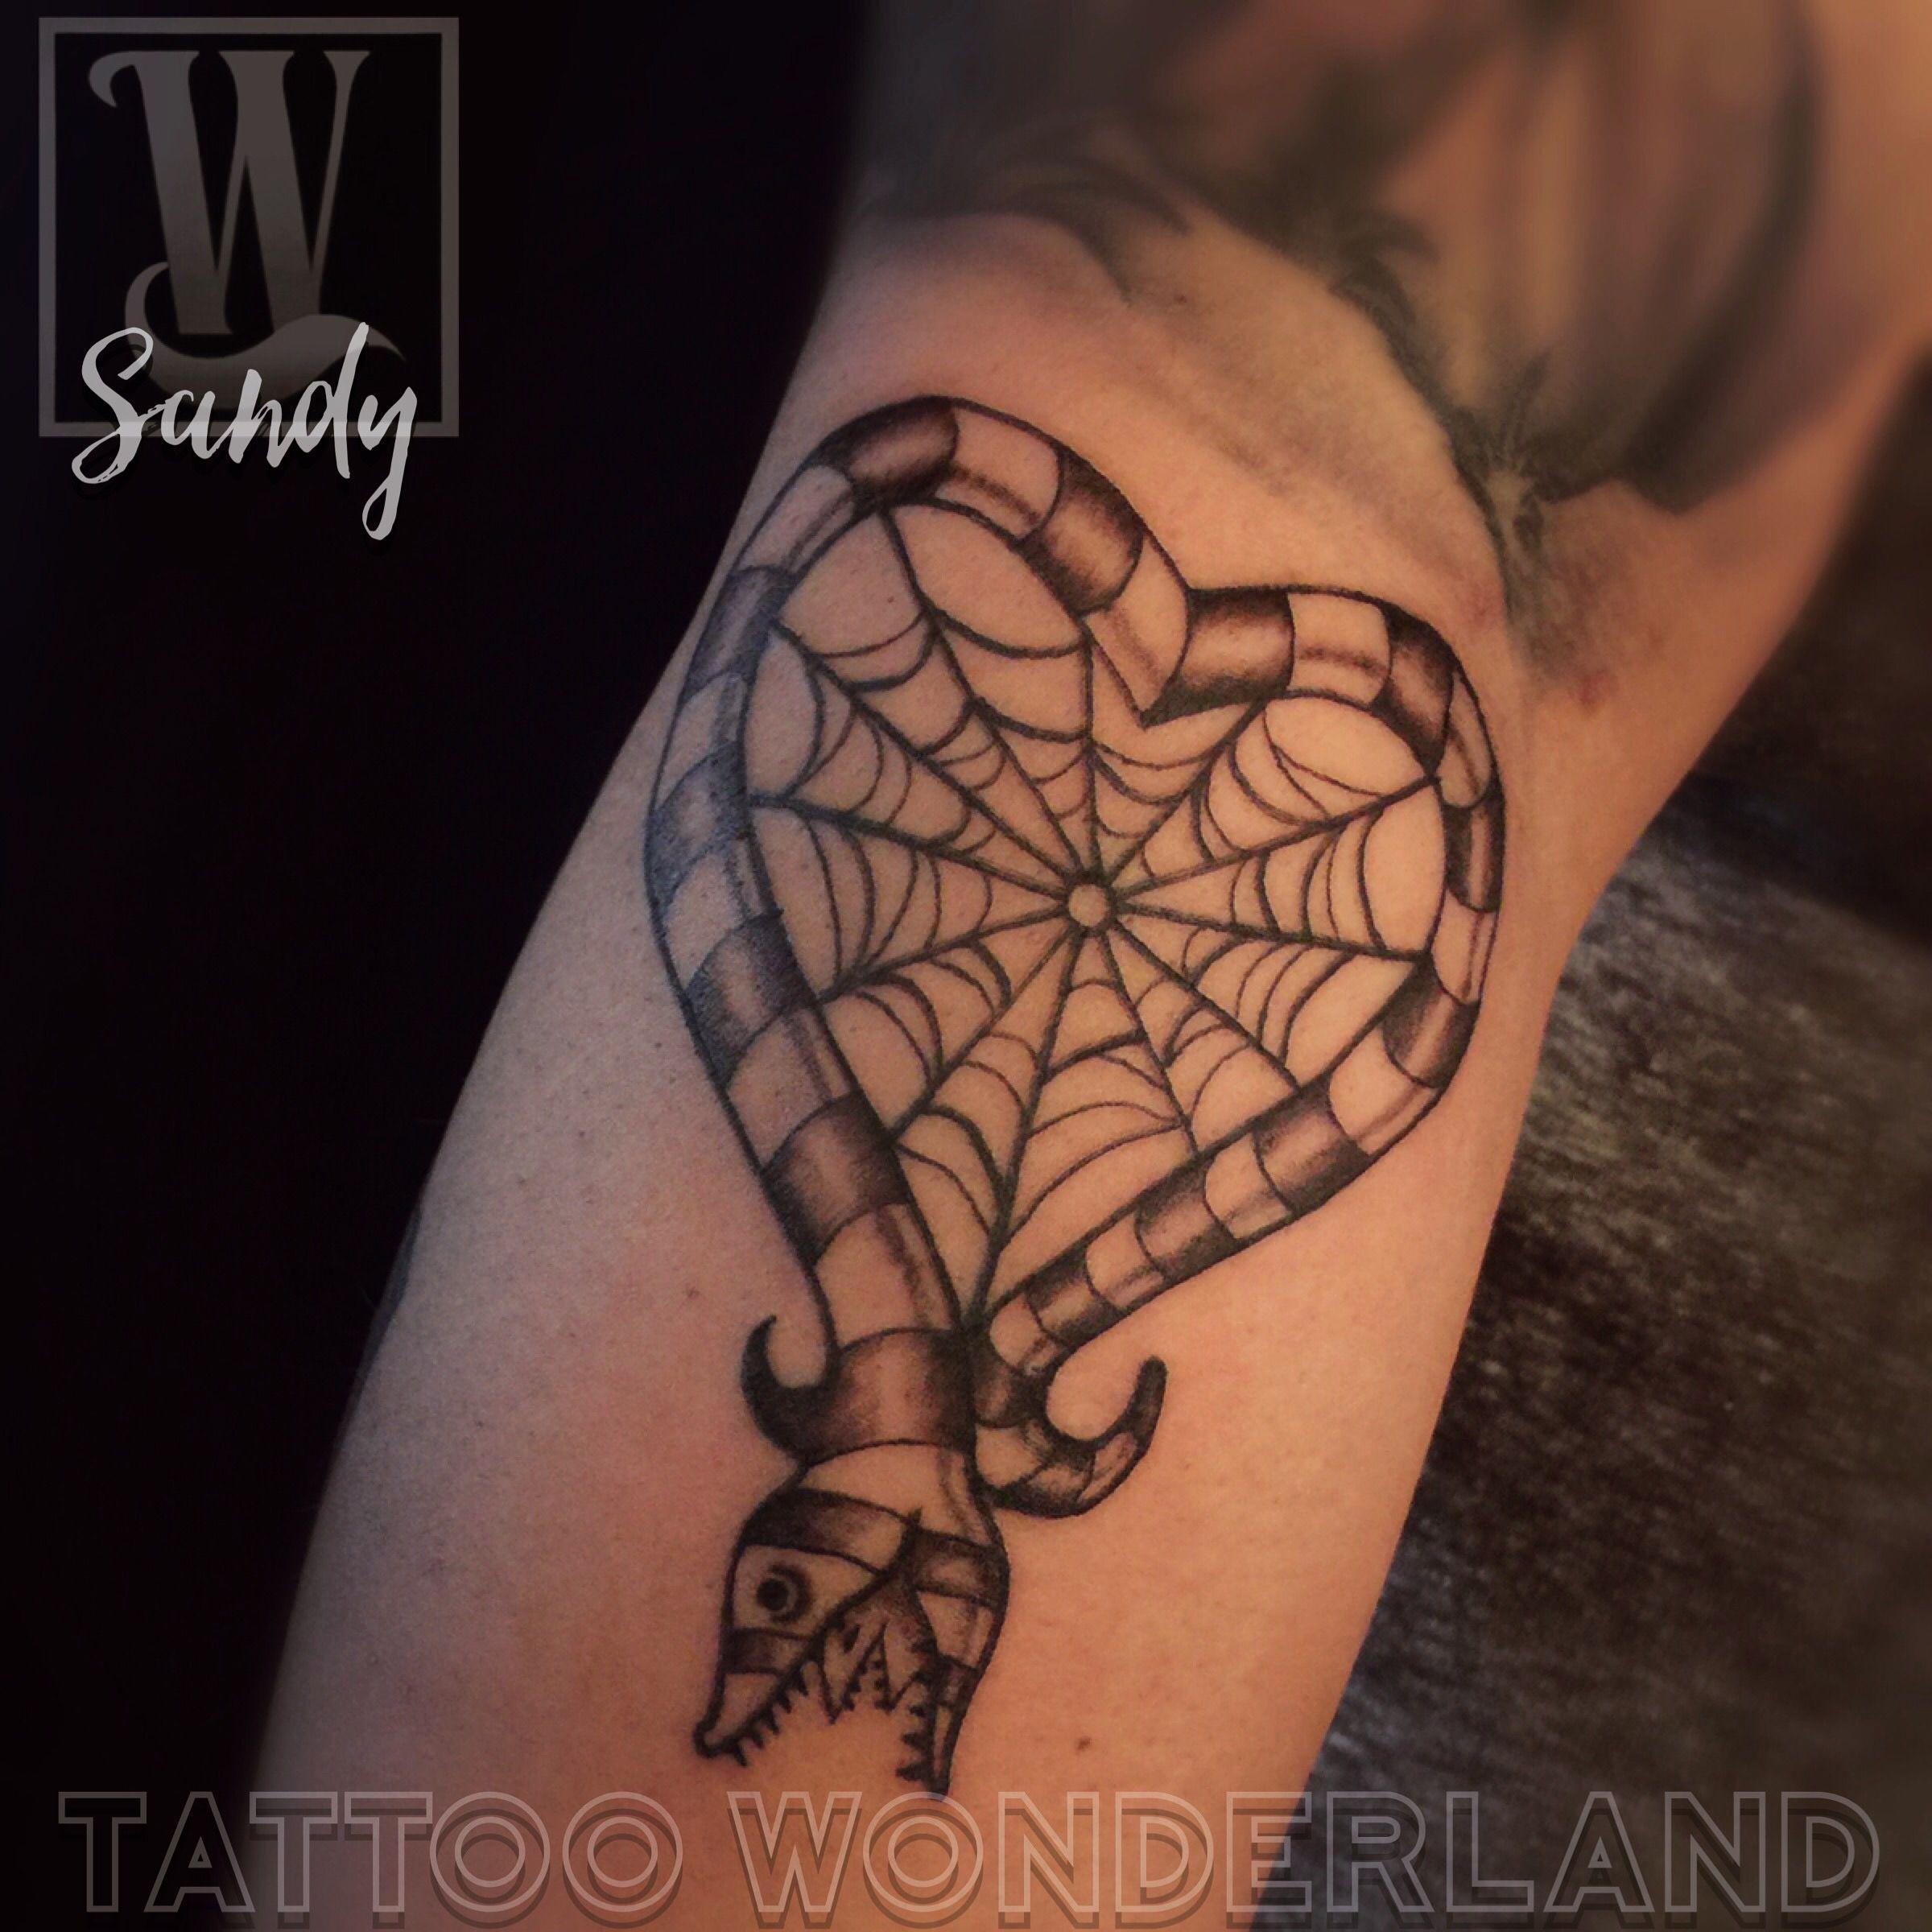 Beetlejuice Sandworm Web Heart Sandydex Tattoos Tattoowonderland Youbelongattattoowonderland Tattoowonderlan Tattoos Tattoo Clothing Beetlejuice Tattoo